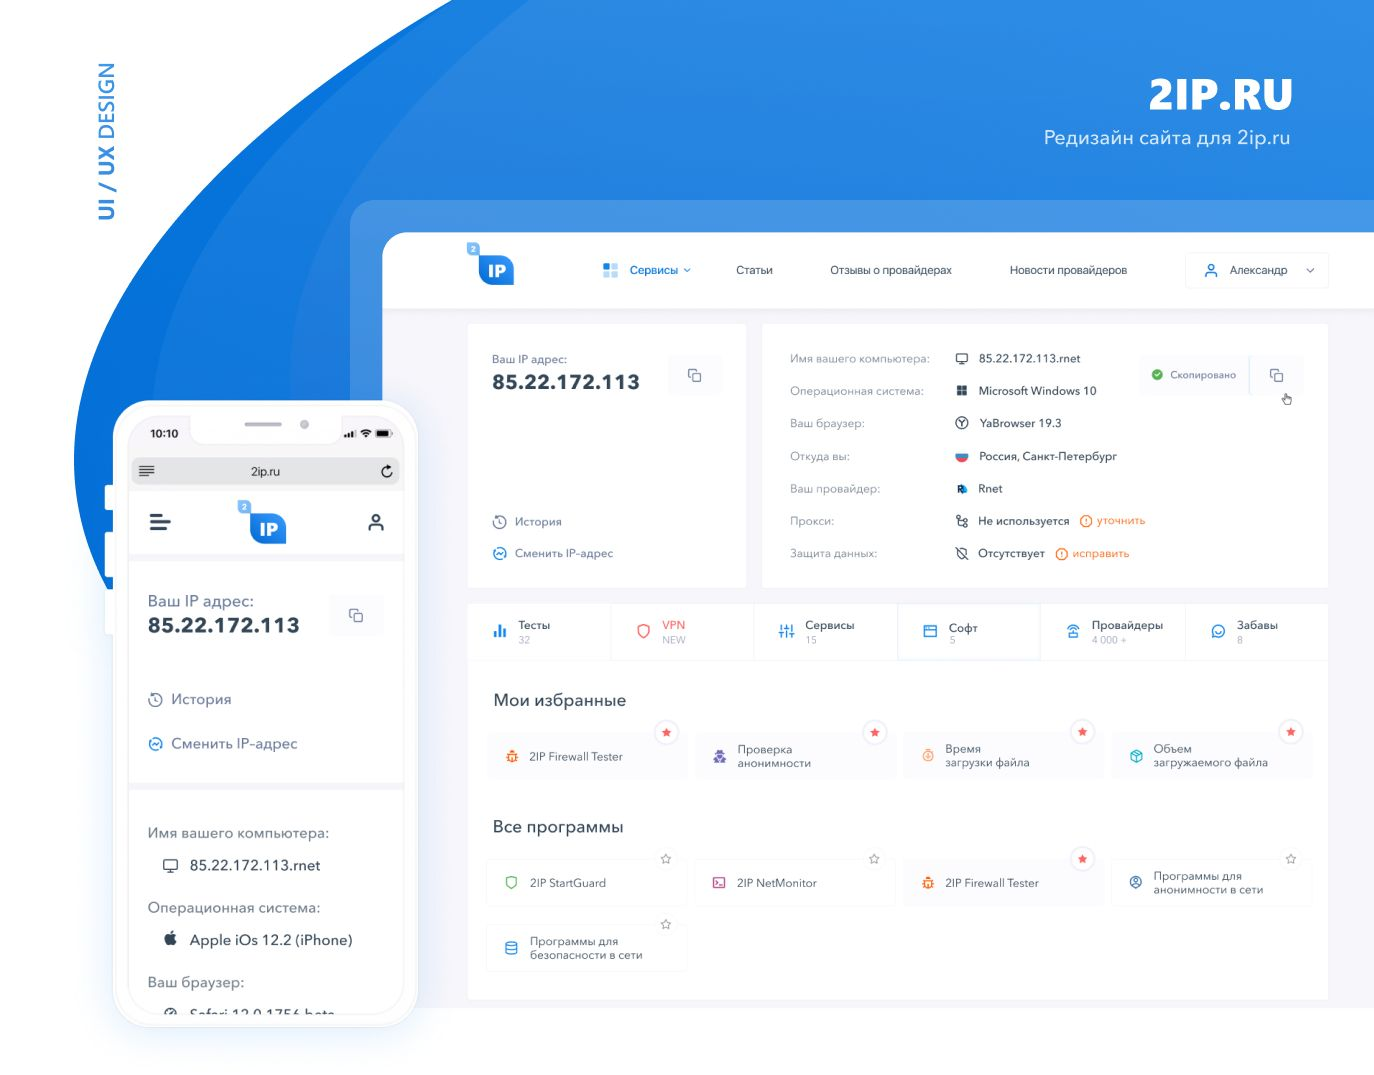 Веб-сайт для 2ip.ru - дизайнер Quaalude